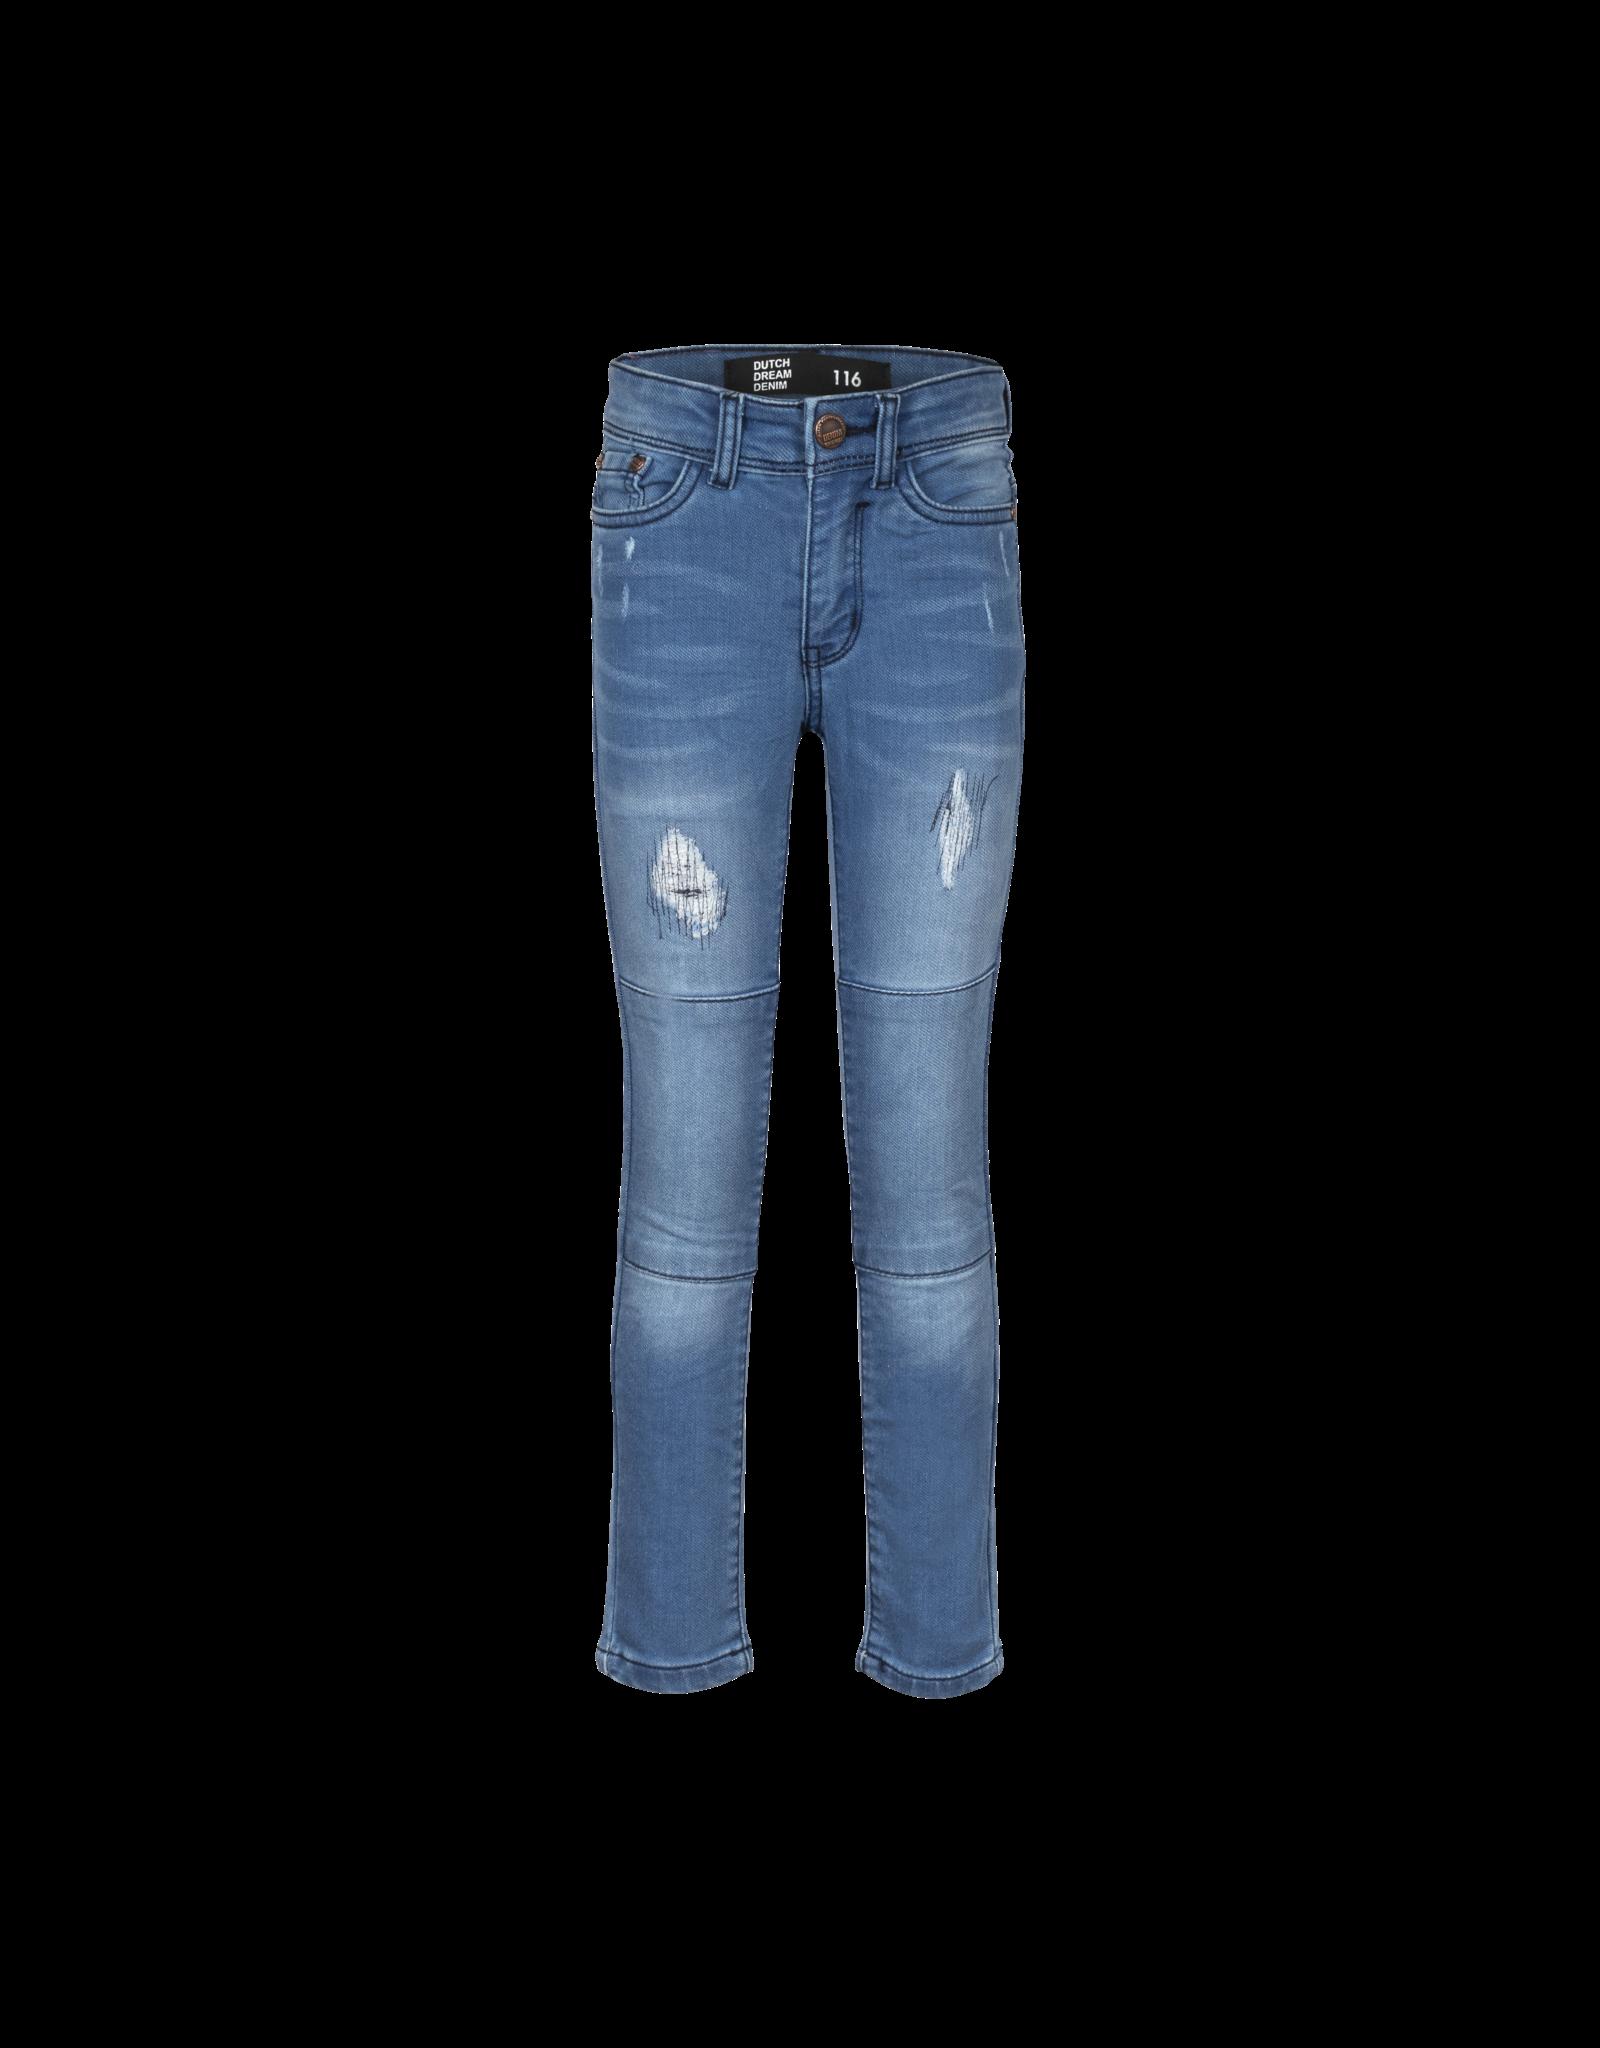 Dutch dream denim NINI, EXTRA SLIM FIT Jogg jeans met dubbele laag stof op de knieën blue